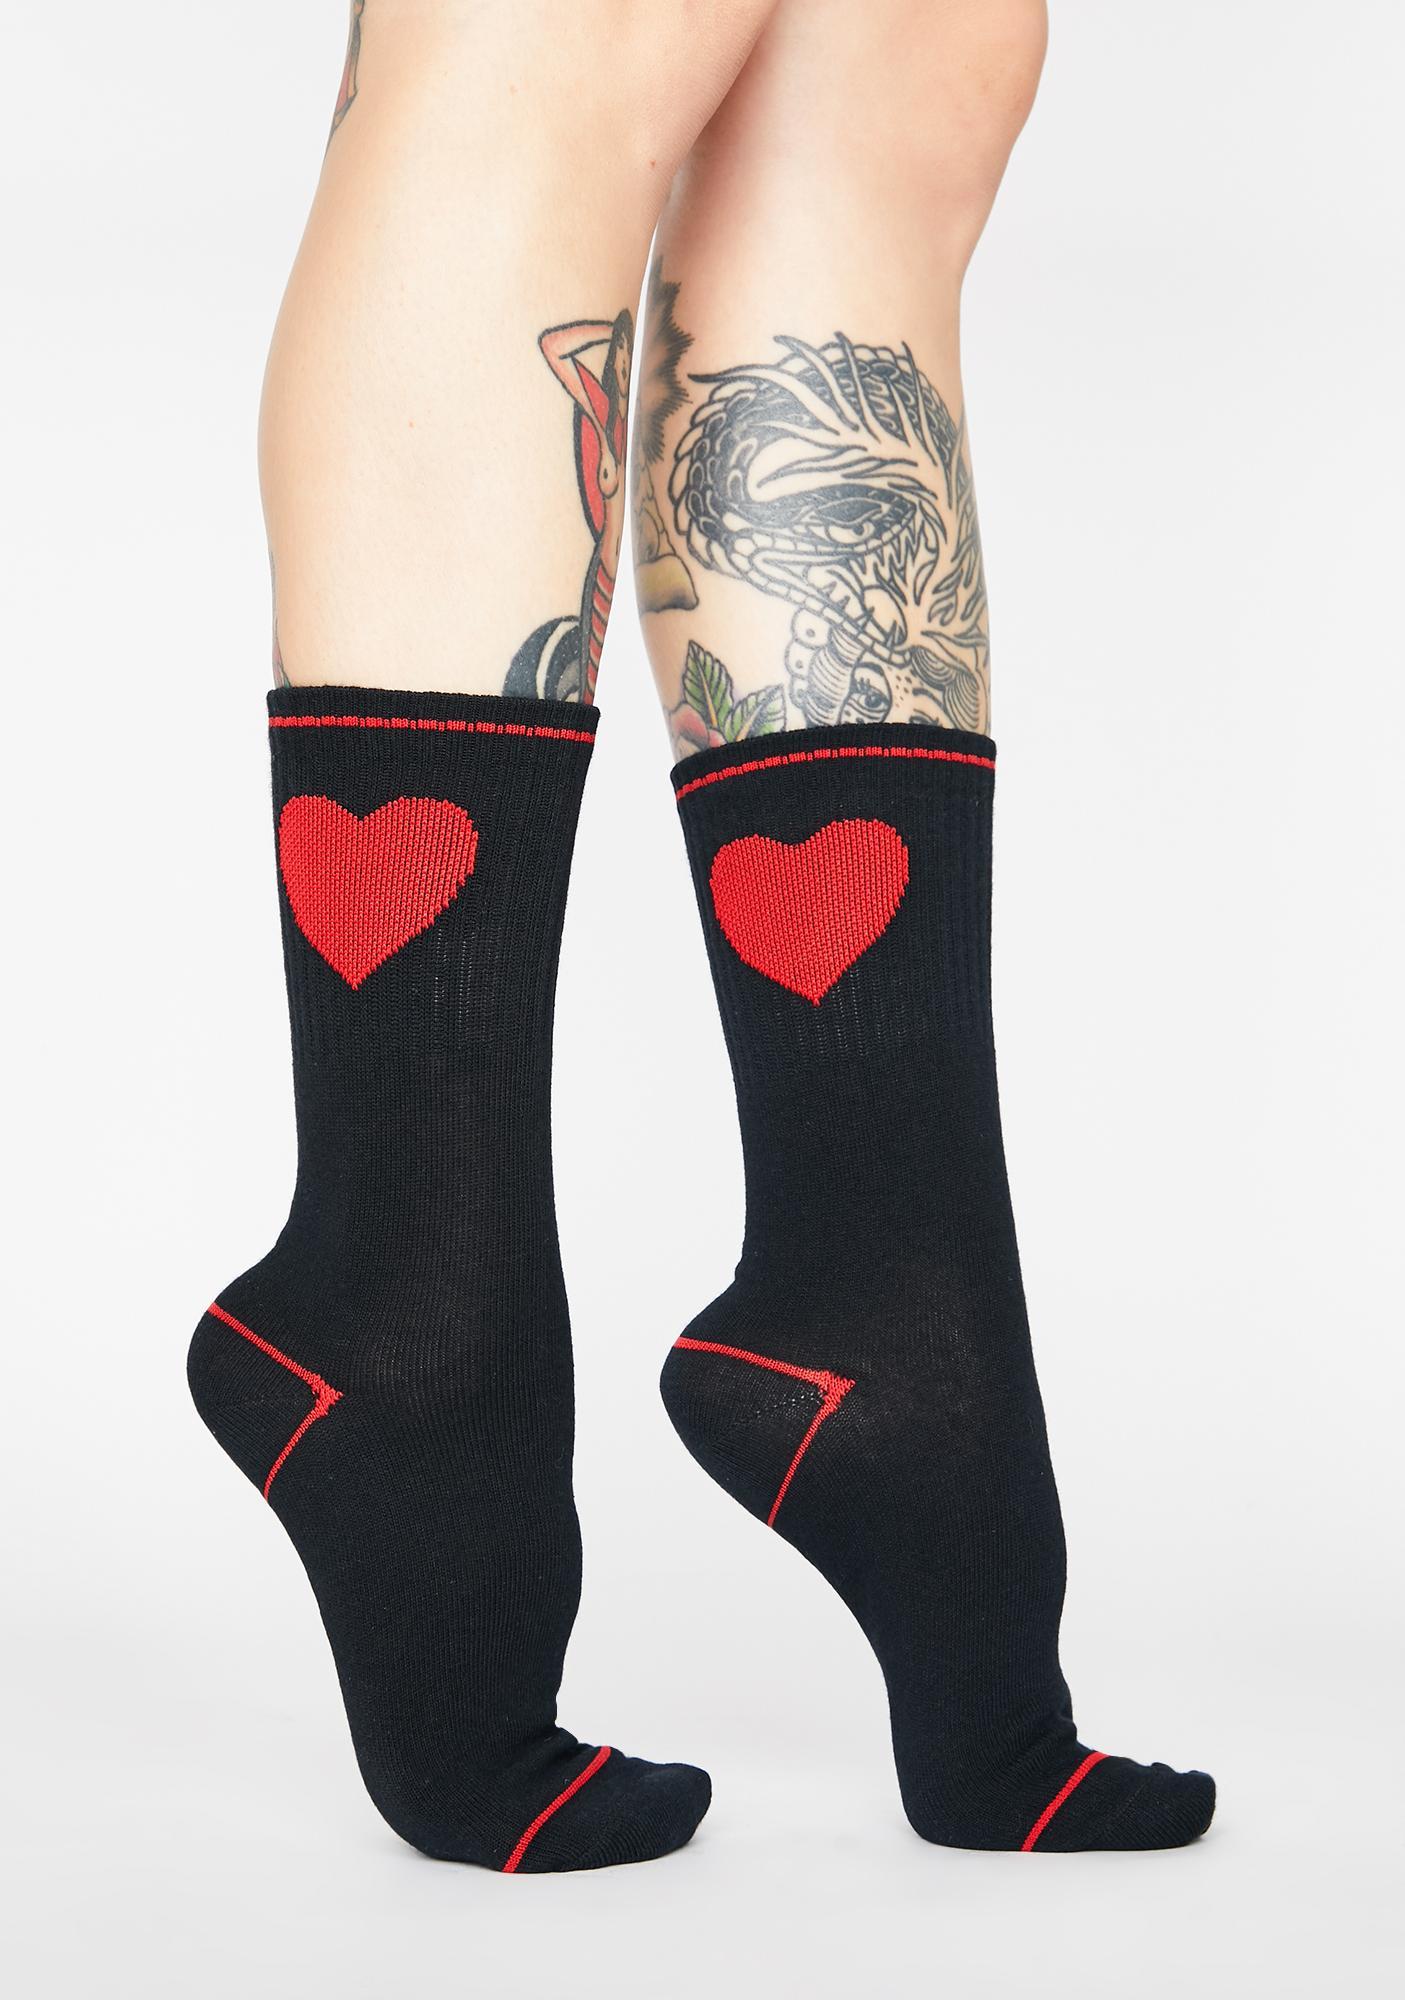 Midnight Show Me Your Heart Crew Socks